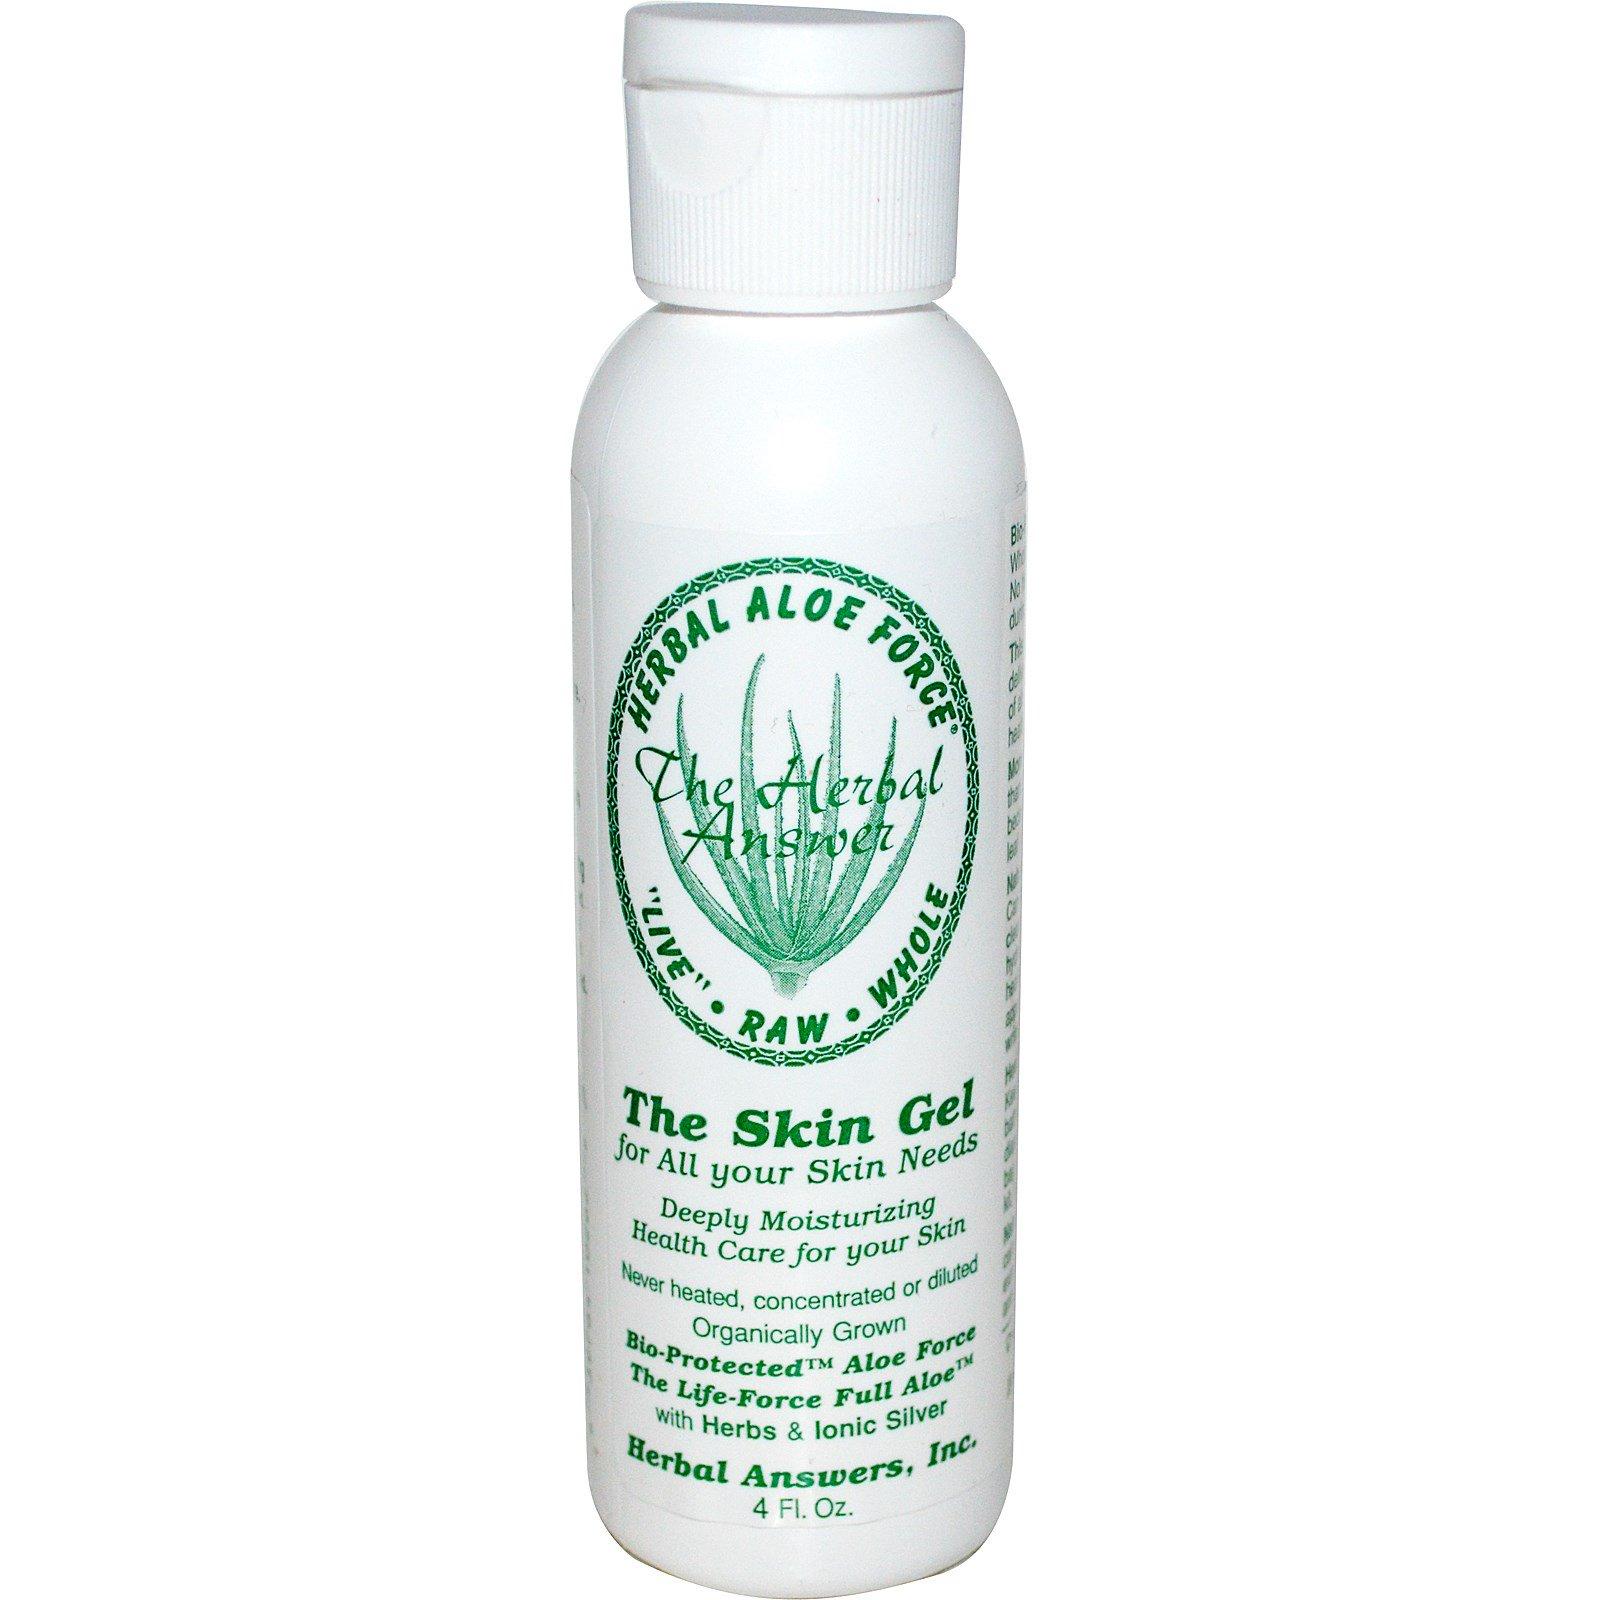 Herbal Answers, Inc, Herbal Aloe Force, гель для кожи, 4 жидкие унции